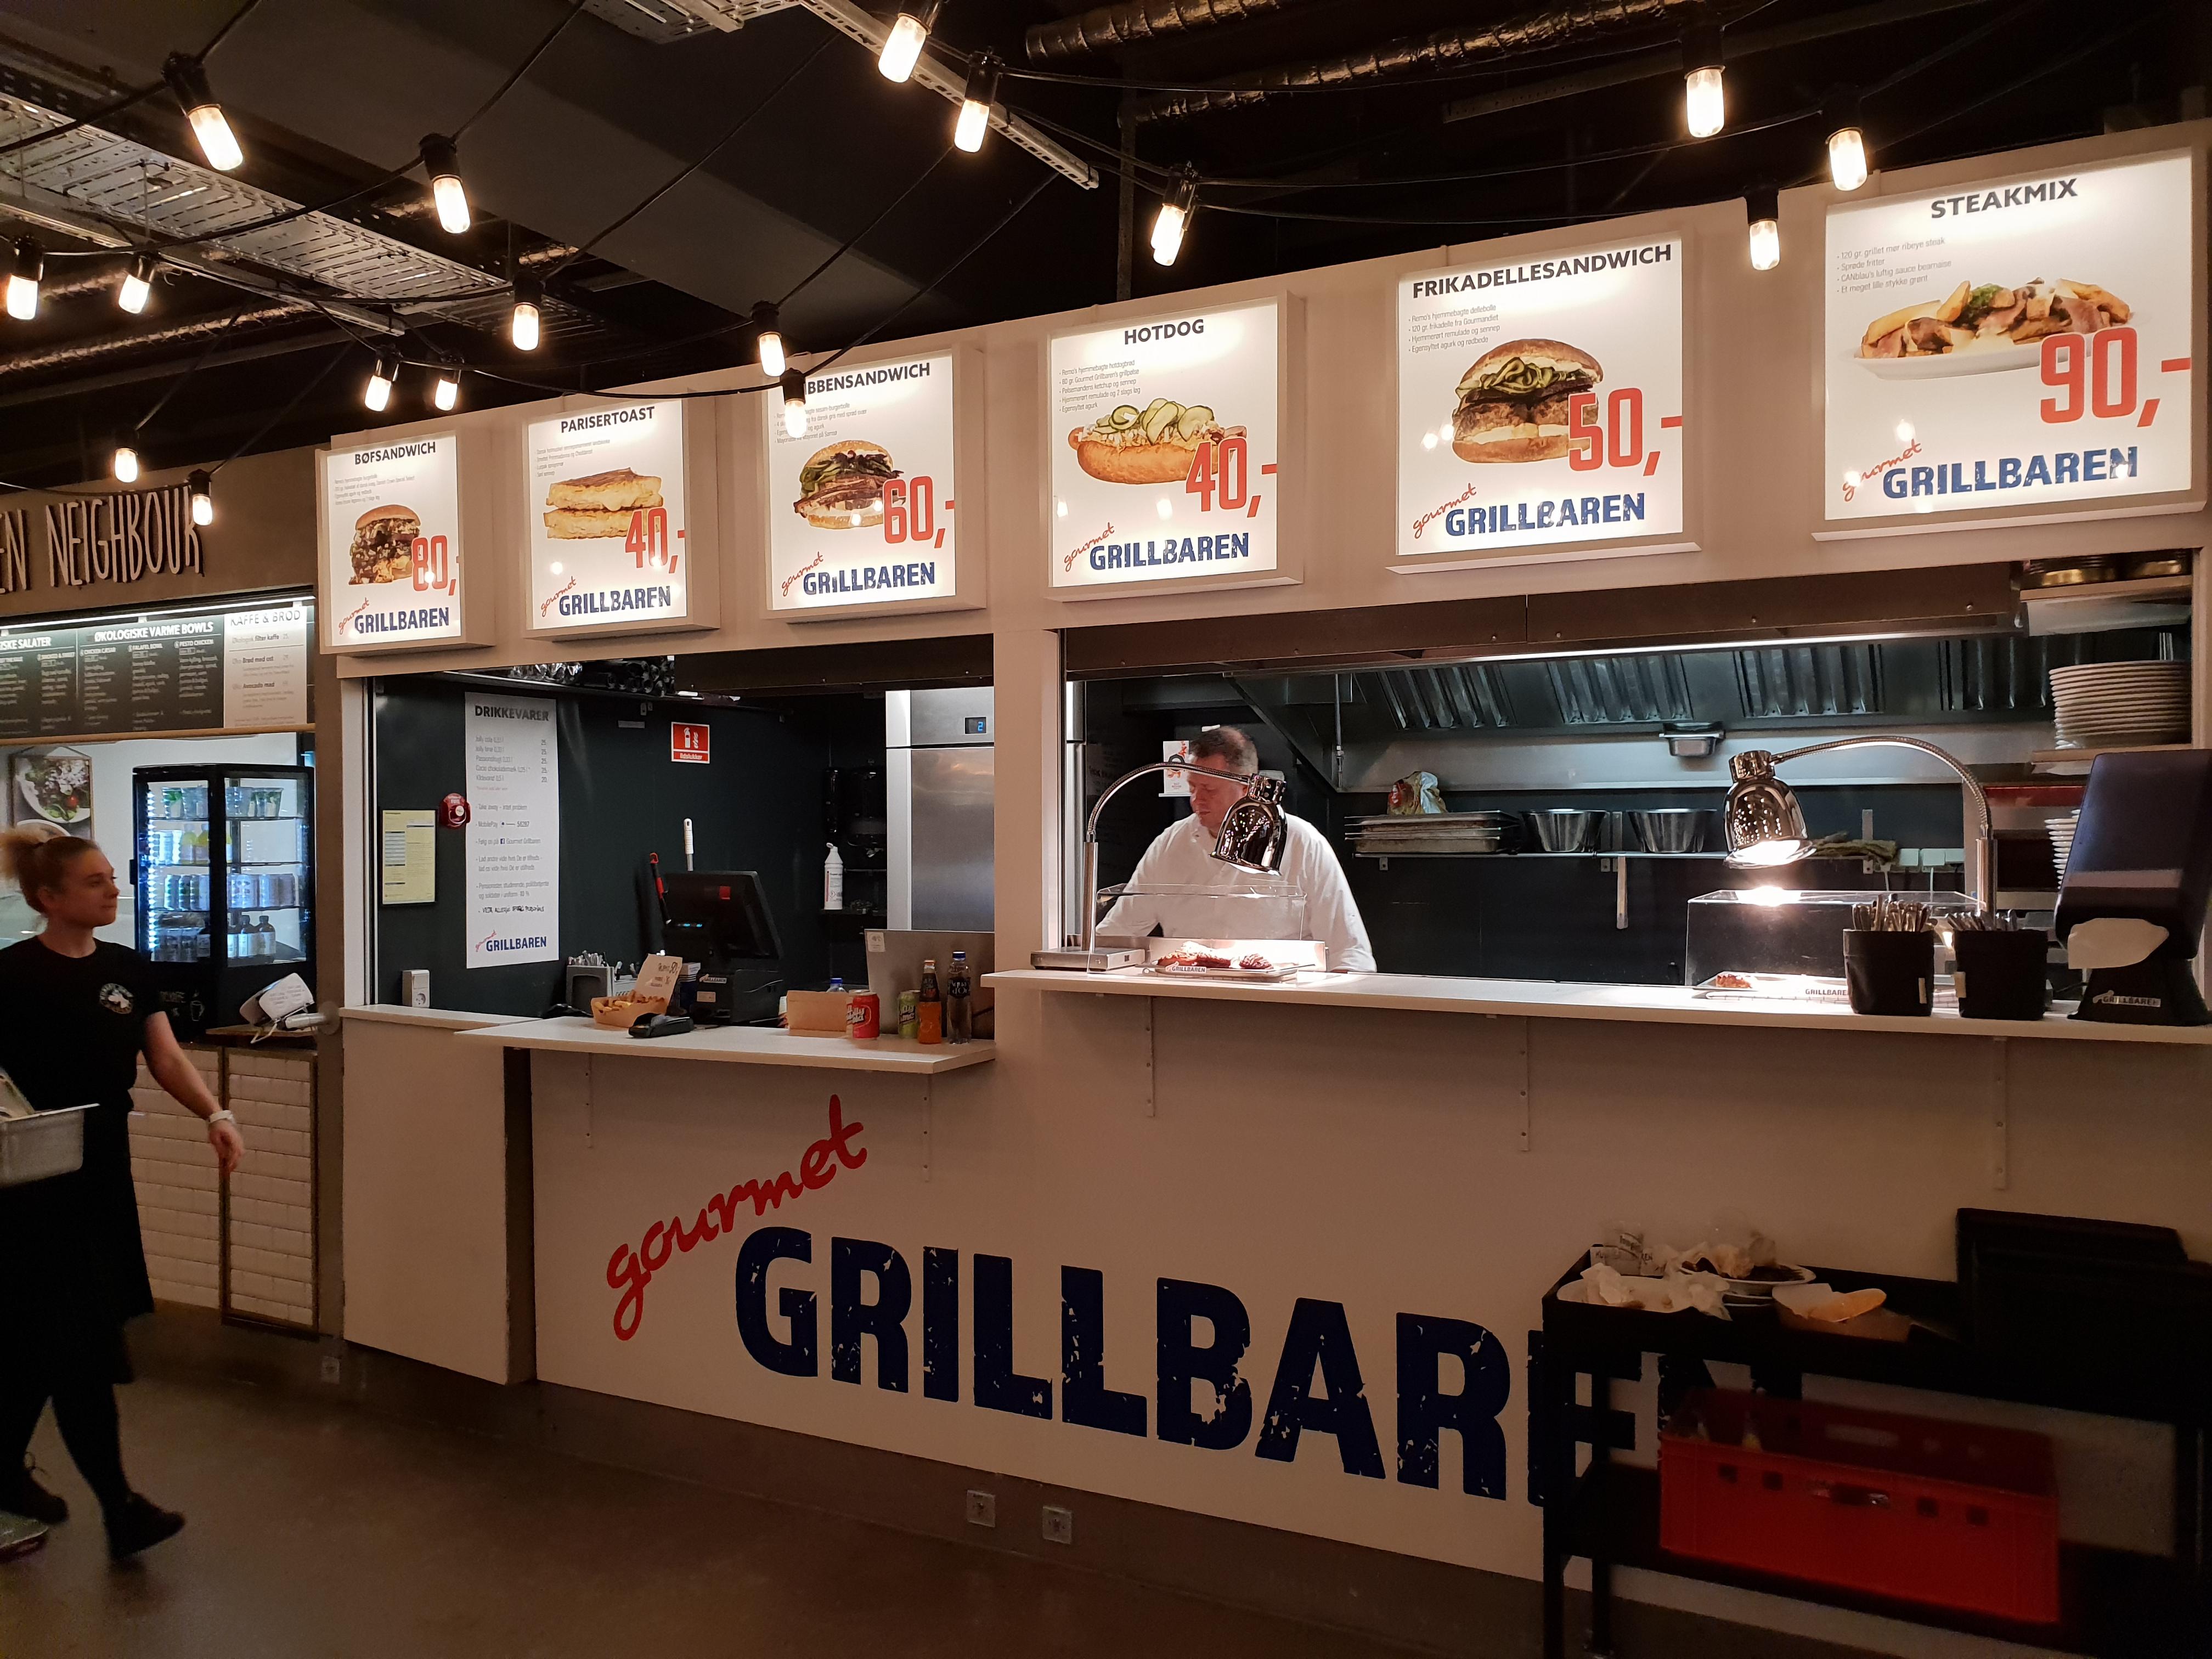 Gourmet Grillbar